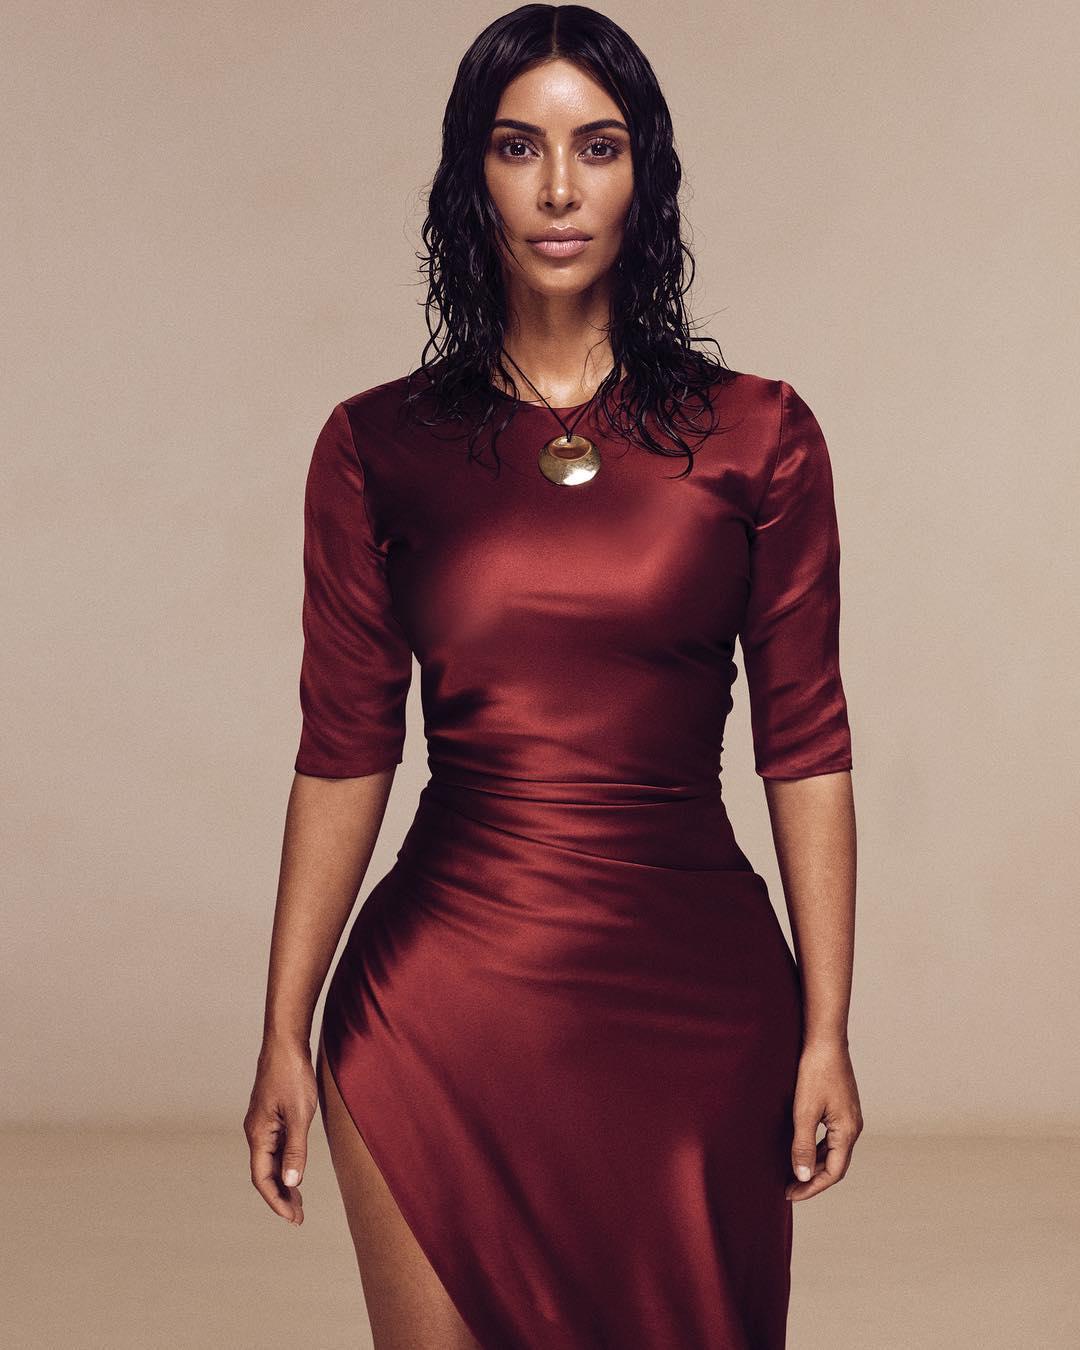 Kim Kardashian vip più pagata al mondo